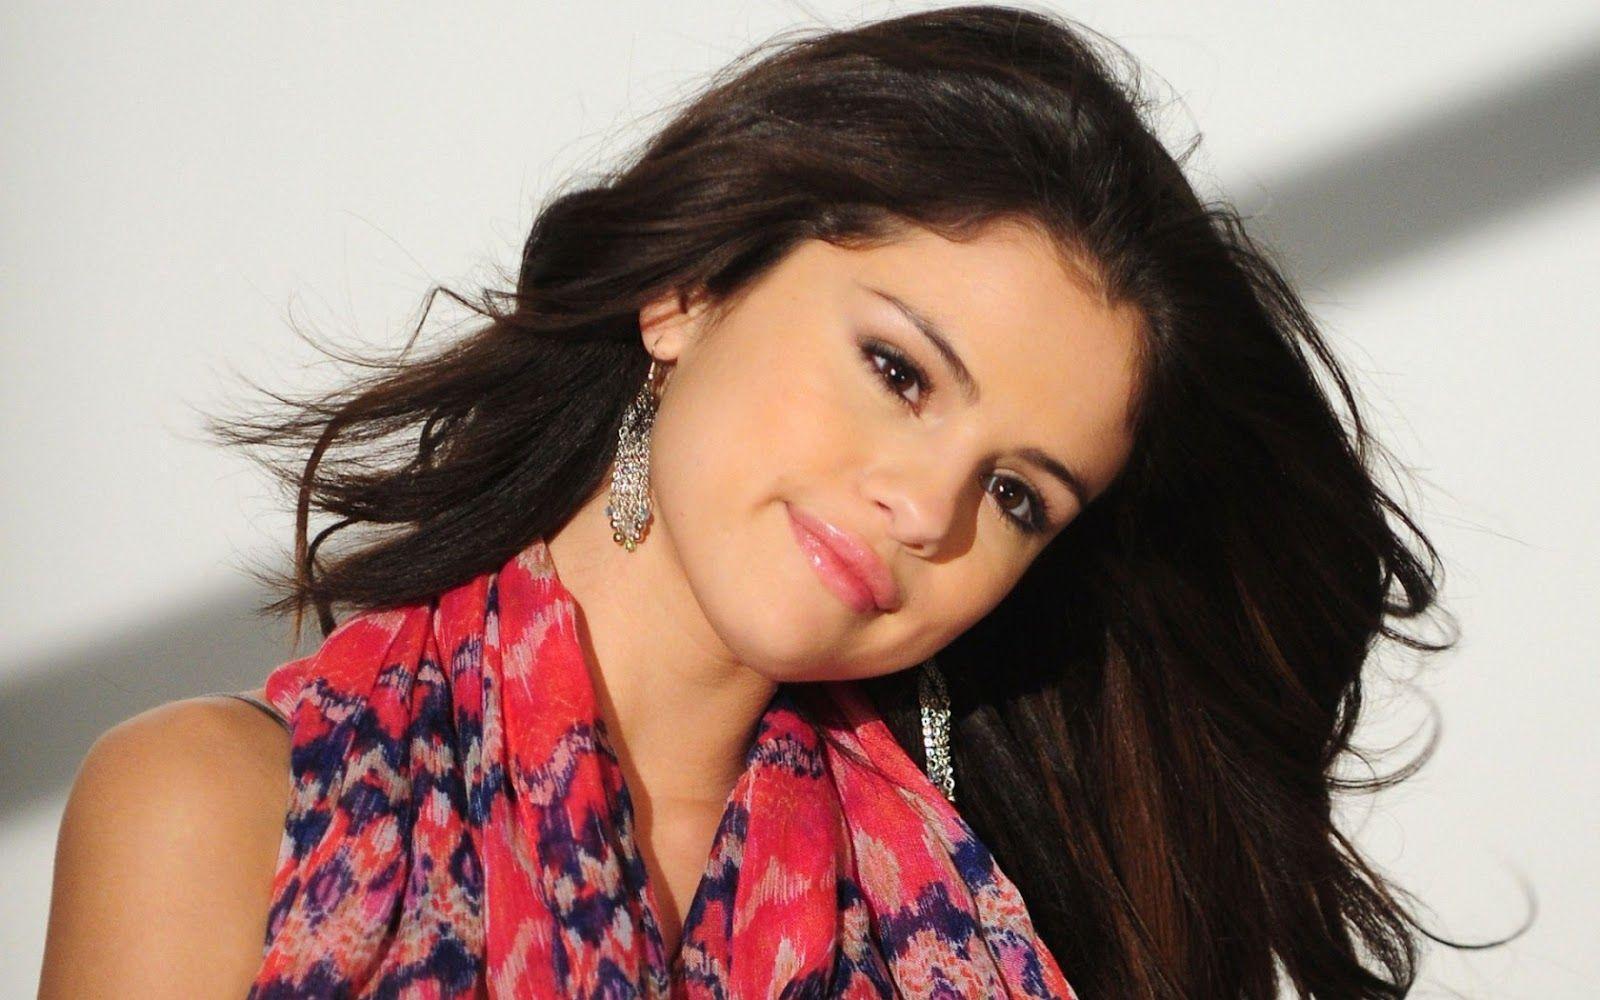 Killer Look Wallpapers: Selena Gomez Cool Hd Wallpapers